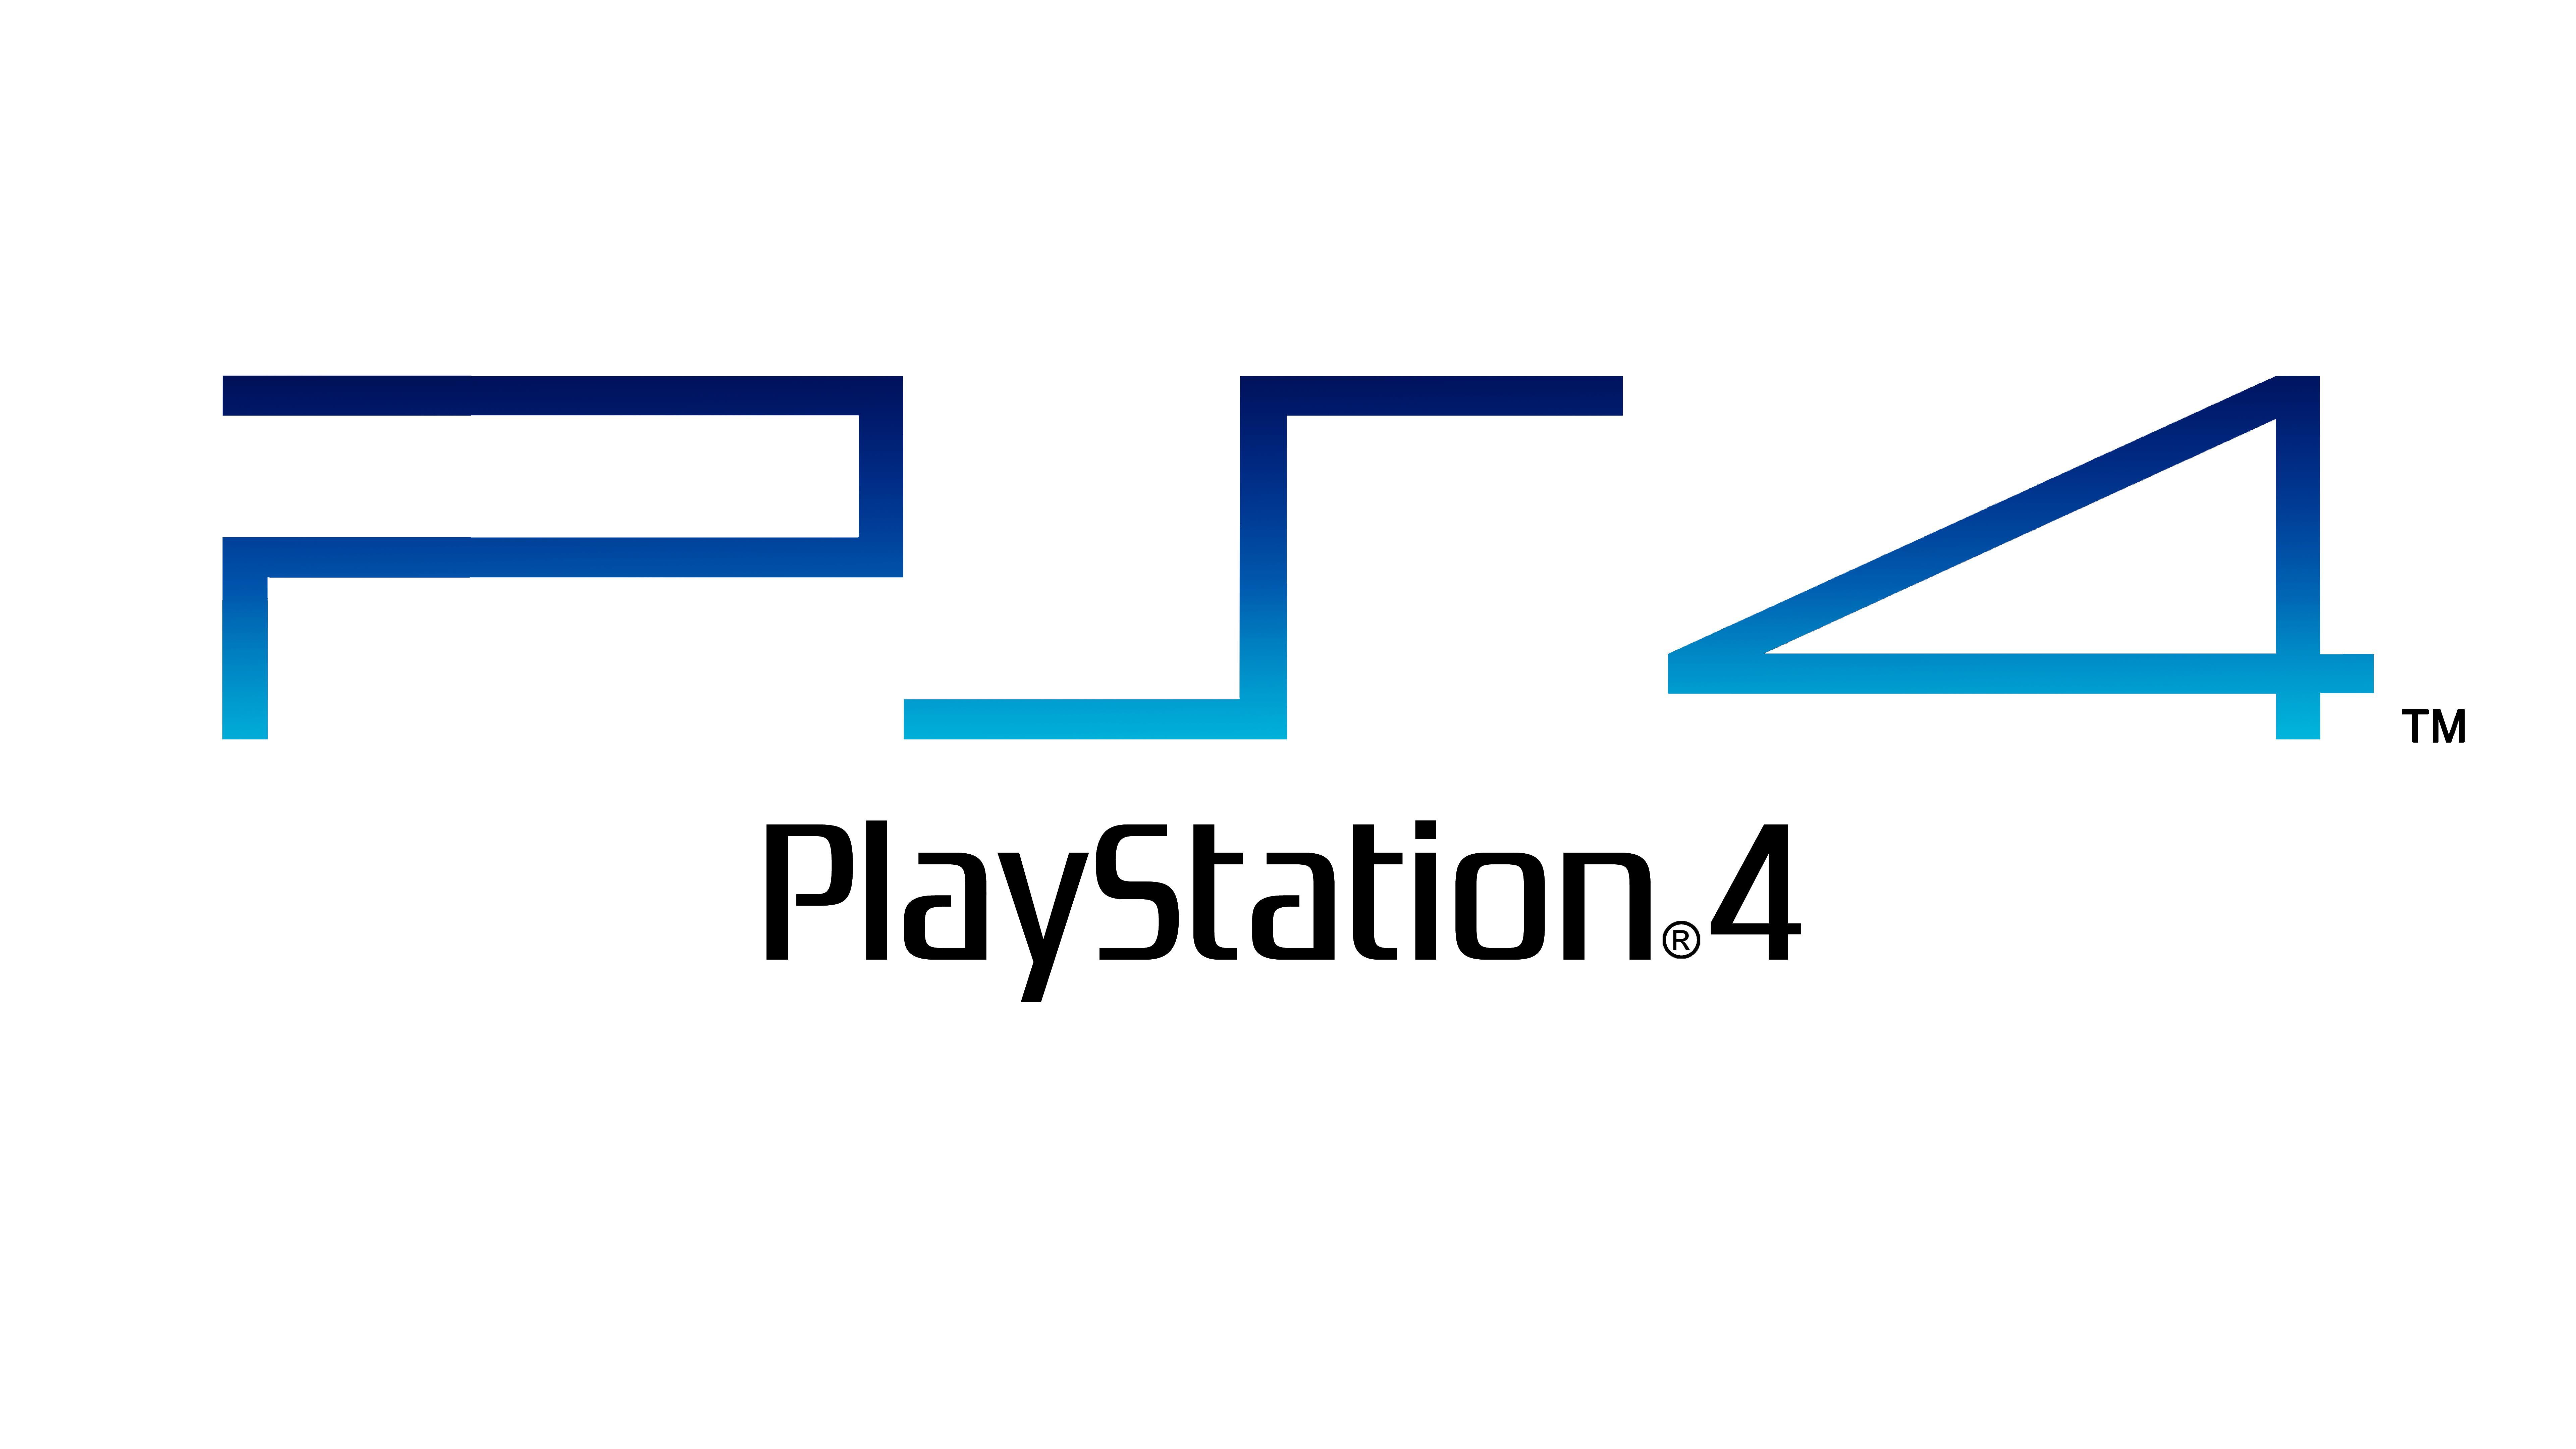 Ps4 logo   Logo ps 2   Ps2 logo wallpaper   PS2 Like PS4 Logo Re 7680x4320